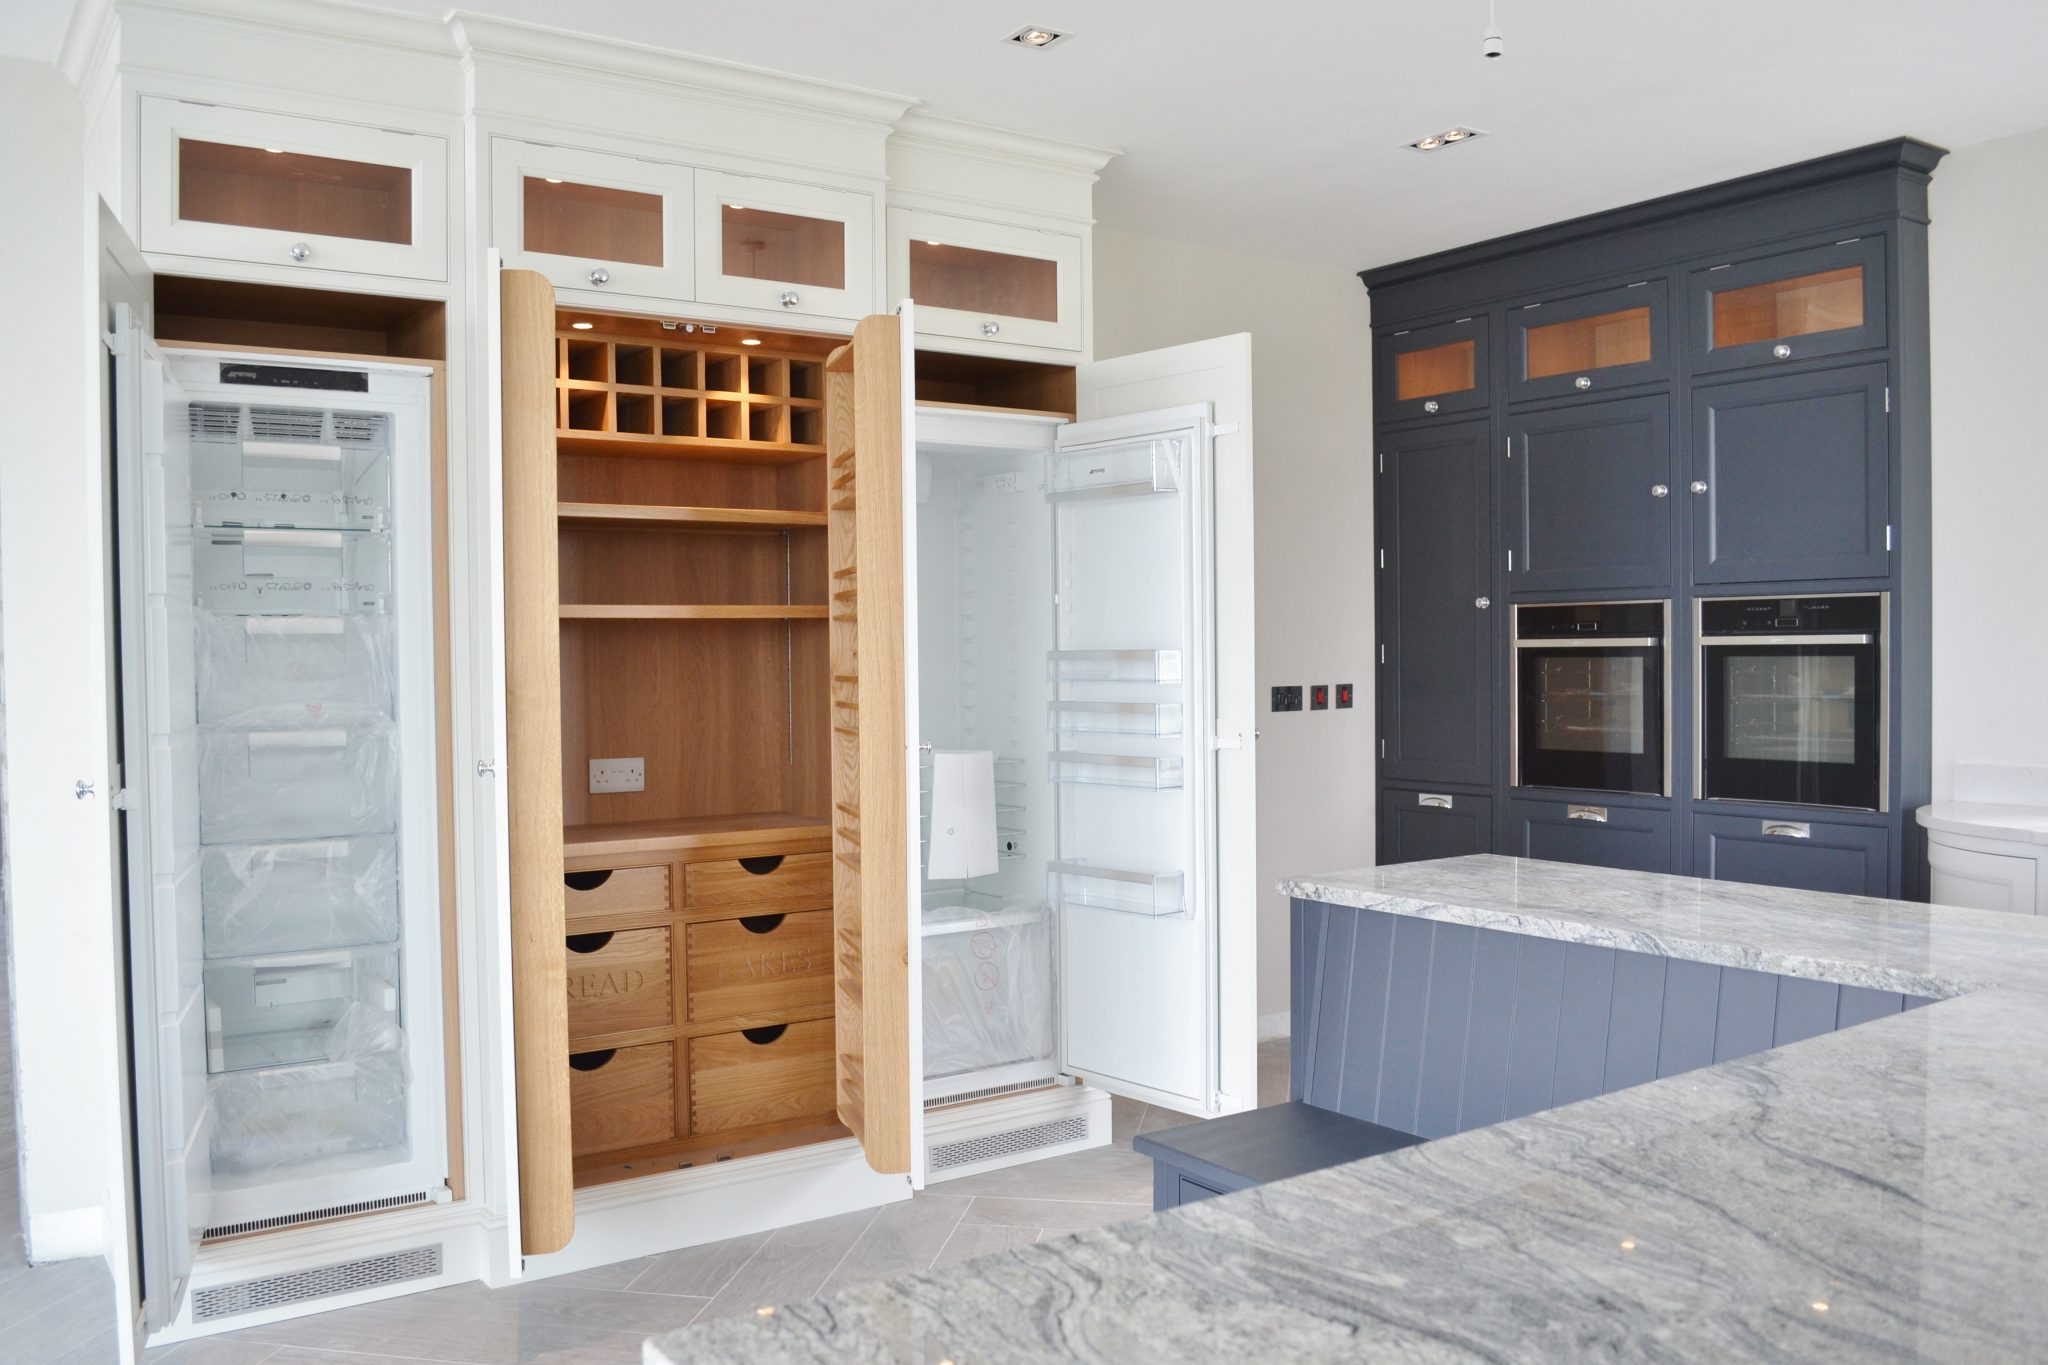 Deanery Bespoke Classic Kitchen Deanery Furniture